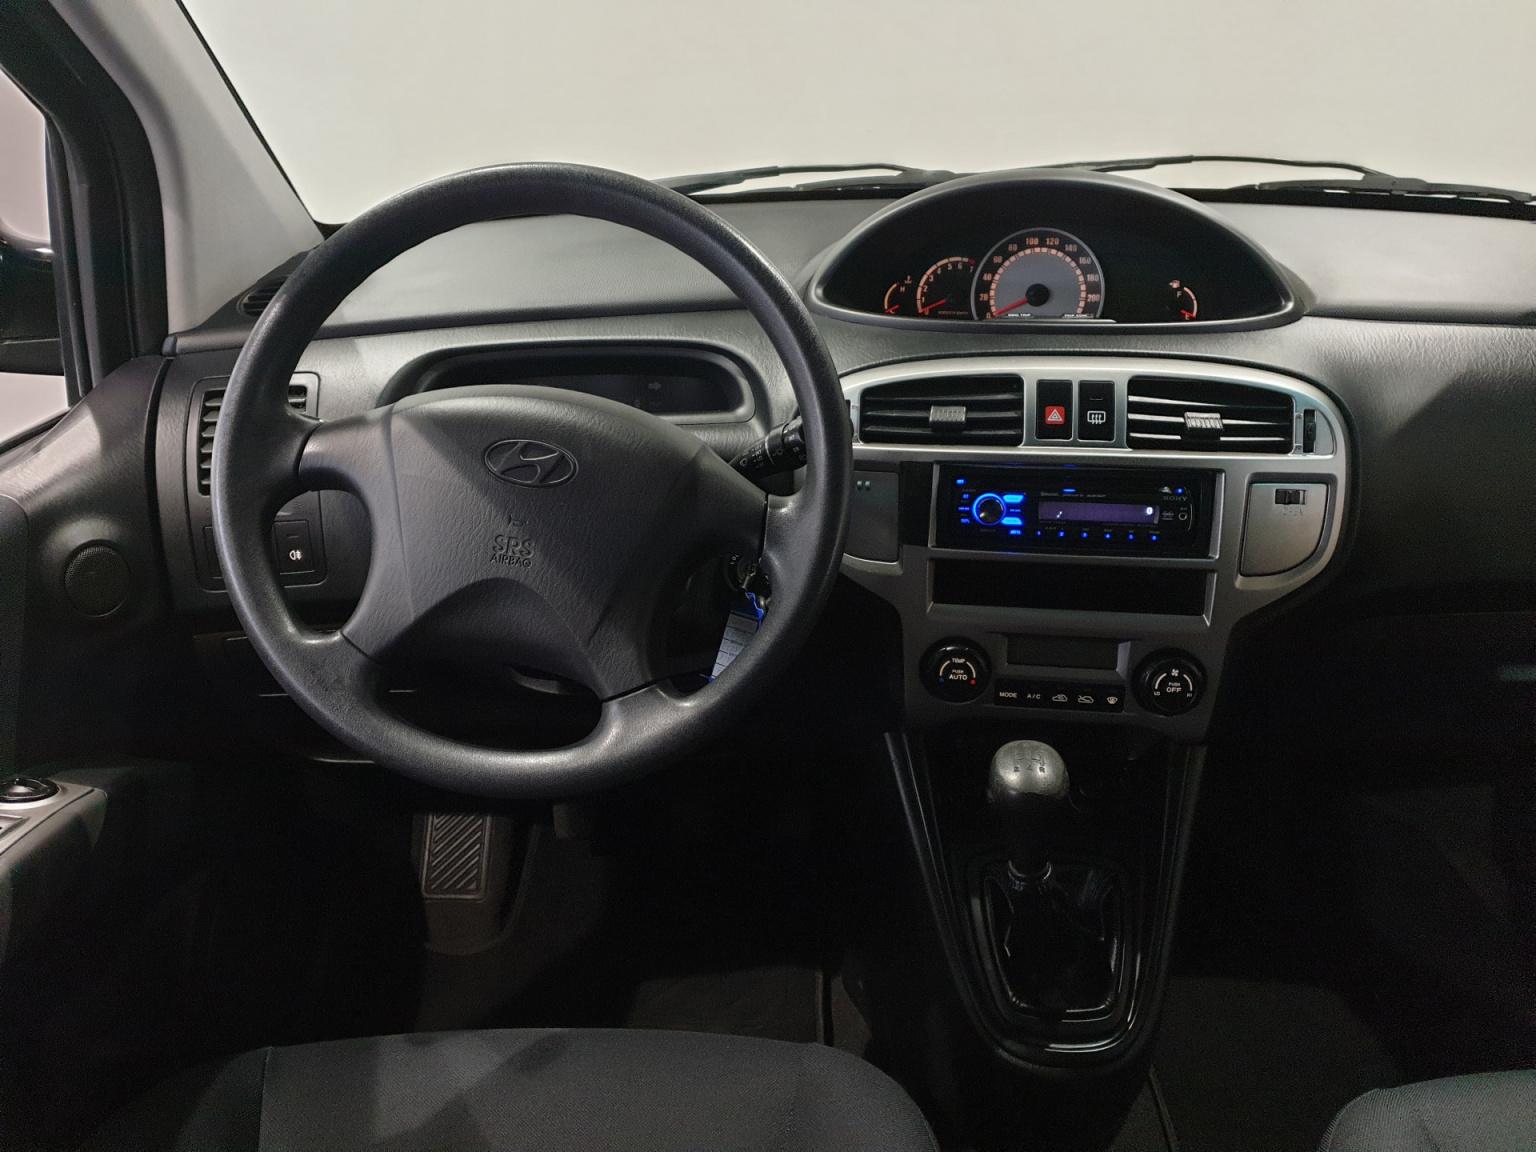 Hyundai-Matrix-16